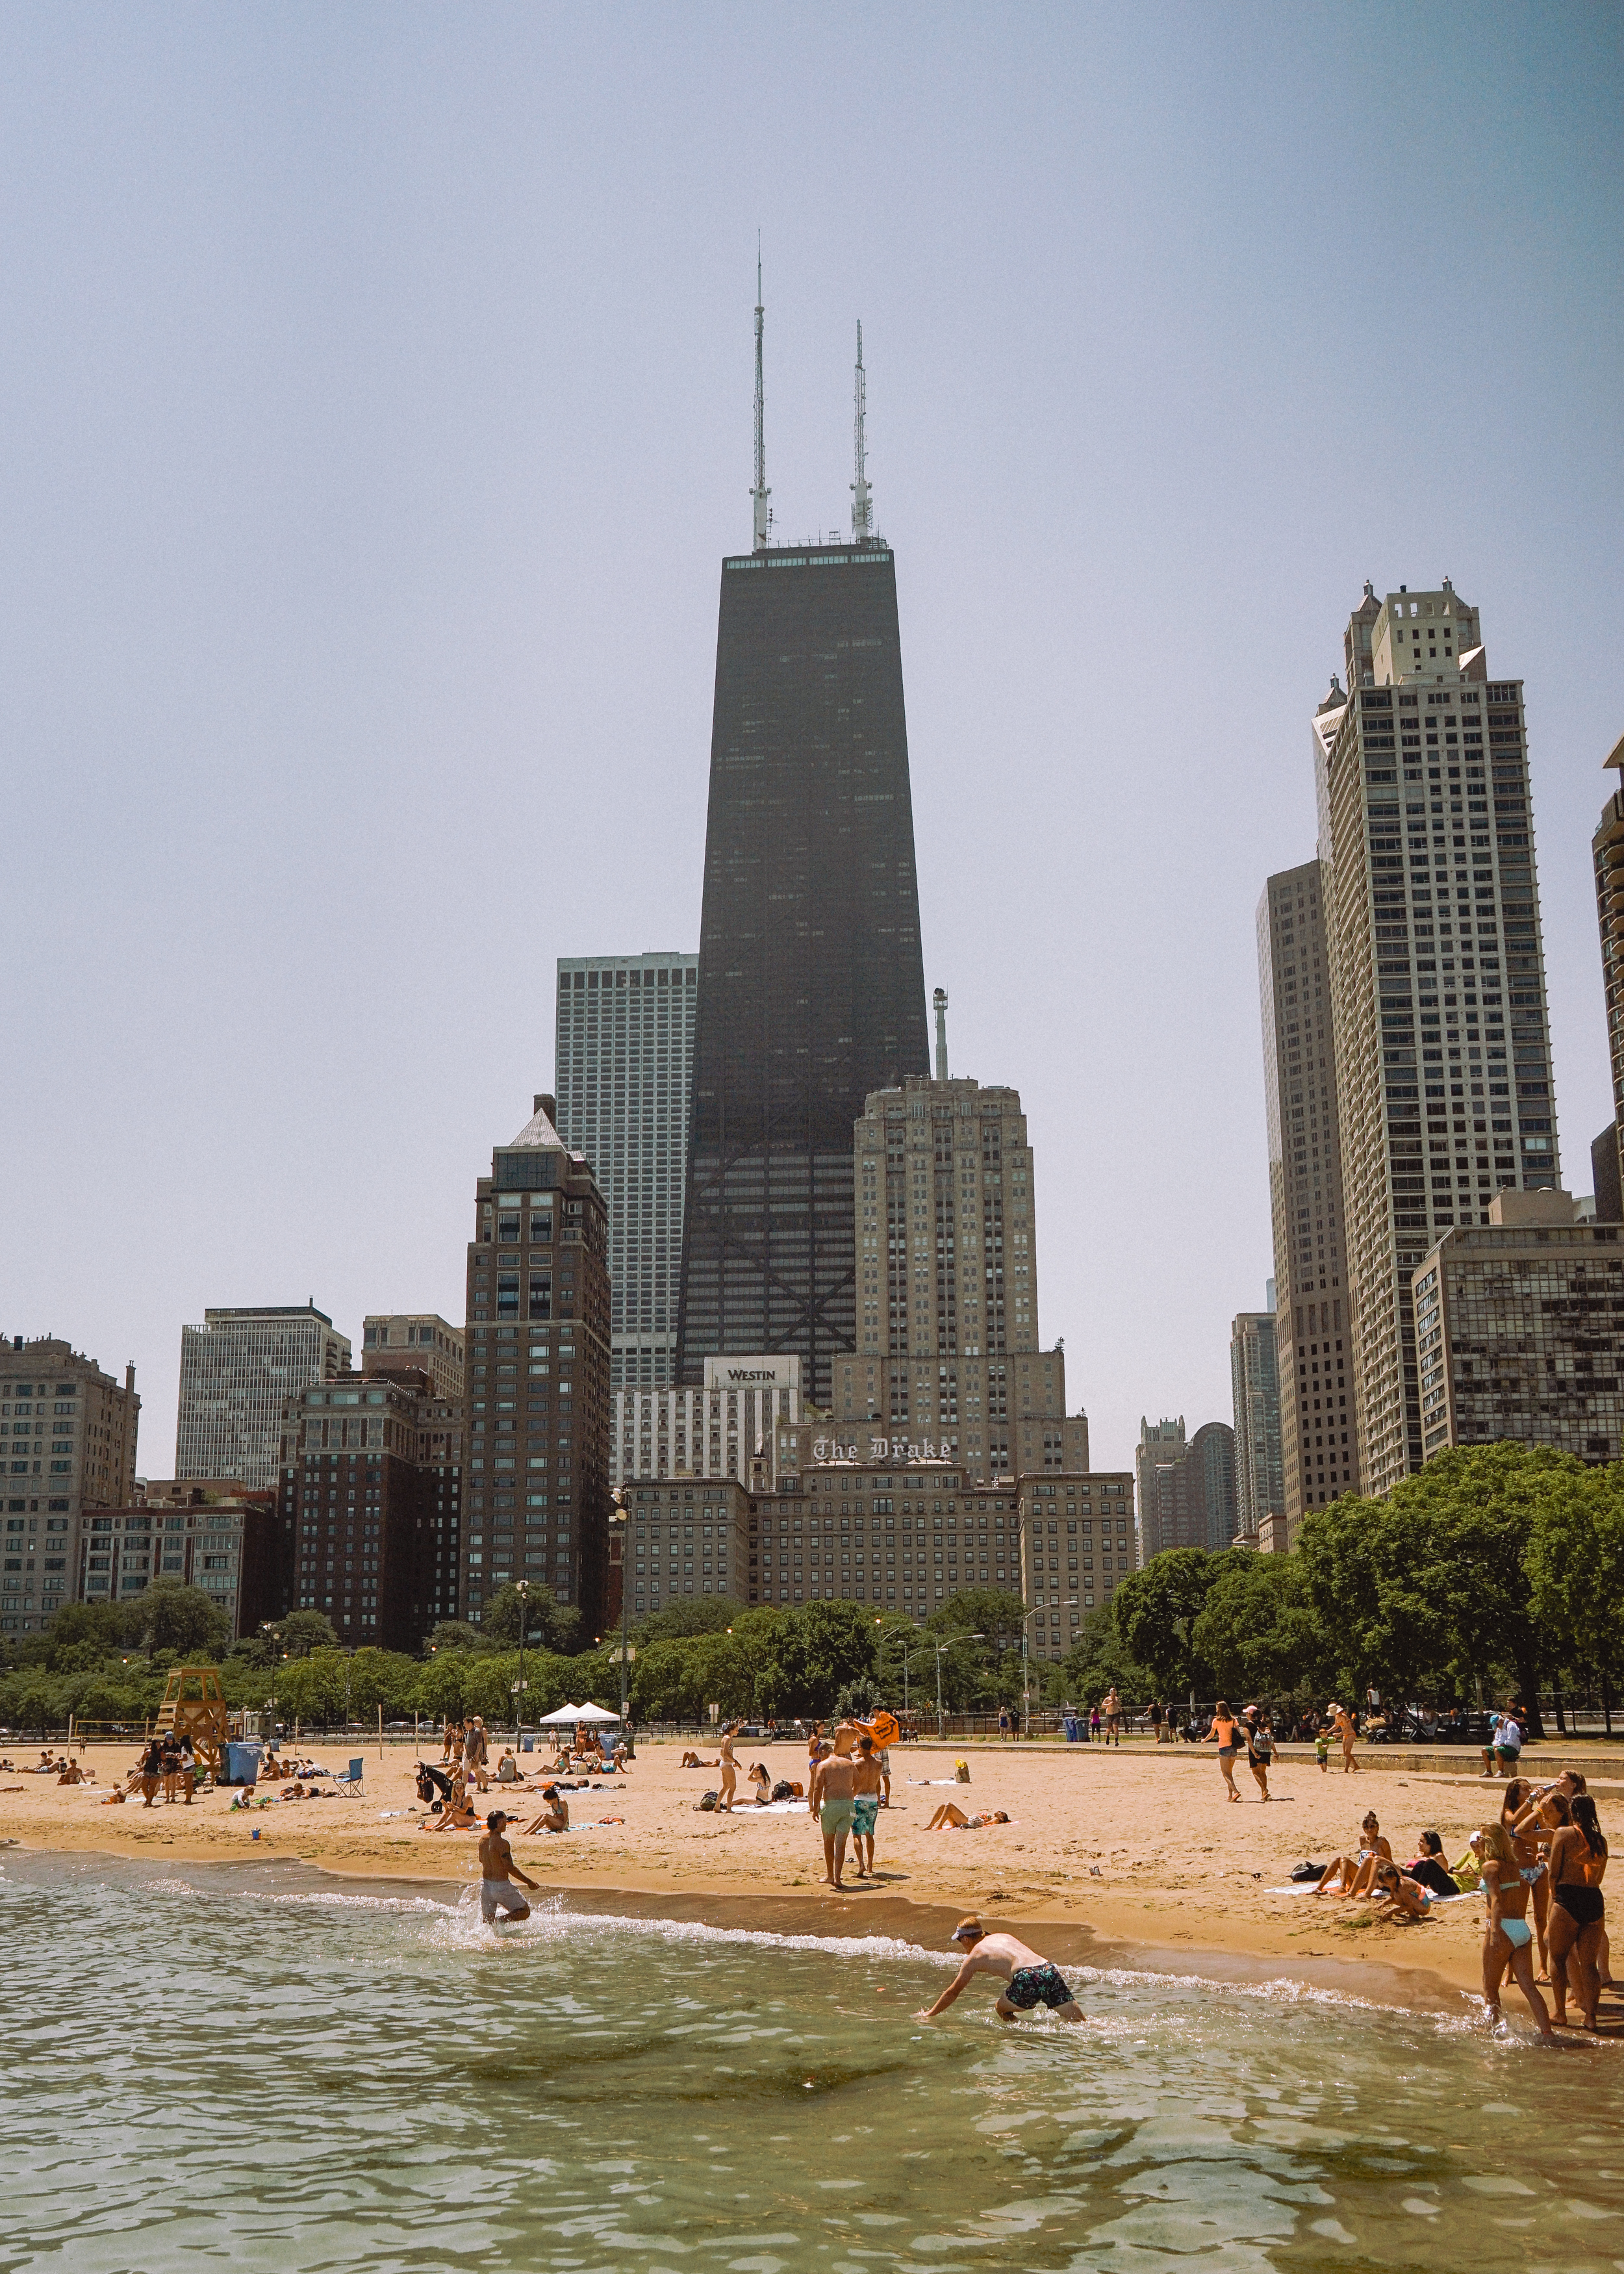 Lake Michigan Beach in Chicago